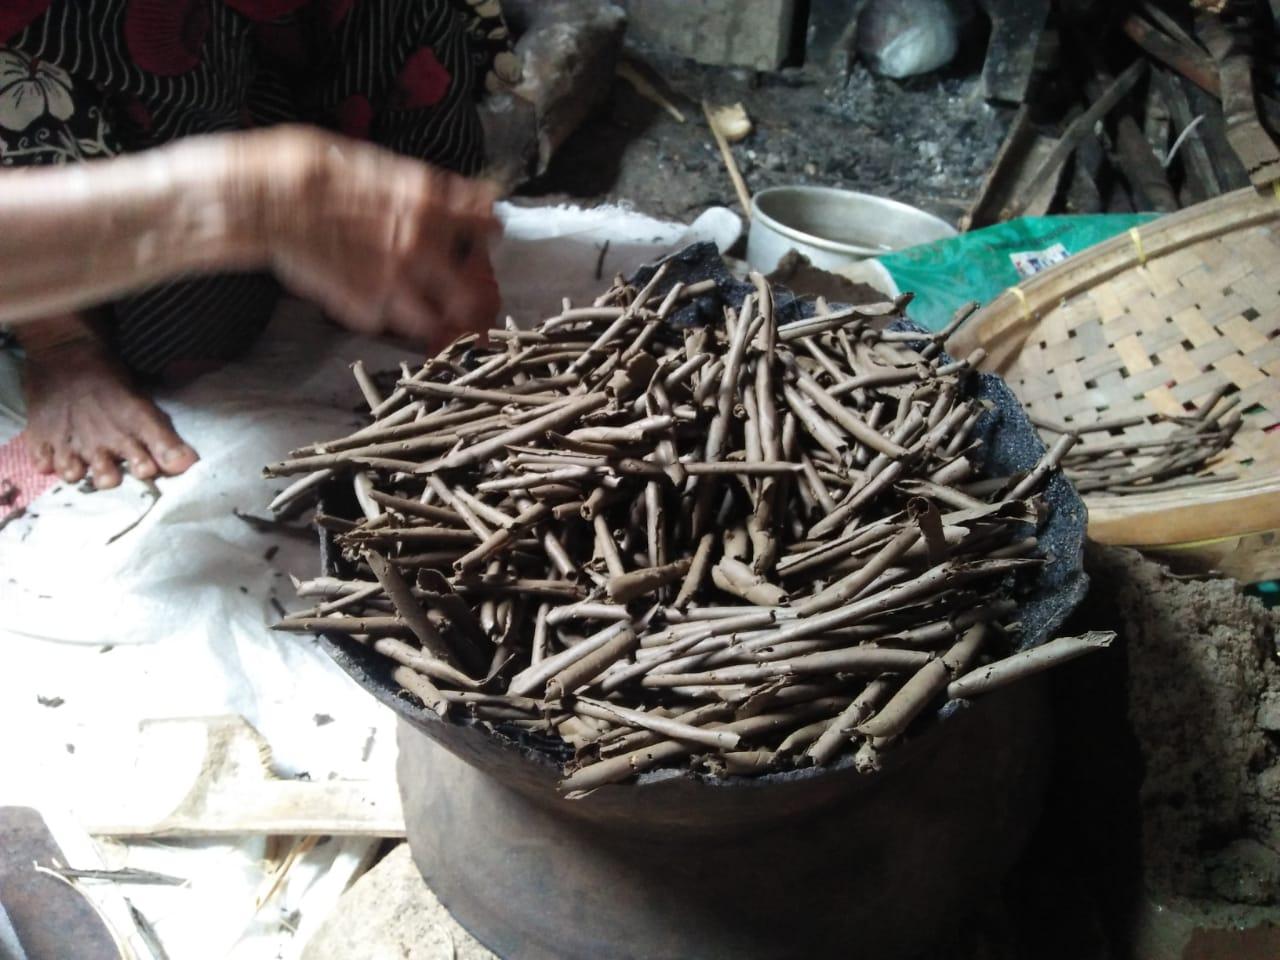 Ampo, makanan tradisional khas Tuban yang terbuat dari tanah liat. (Foto: Moch Abdurrochim/Tugu Jatim)